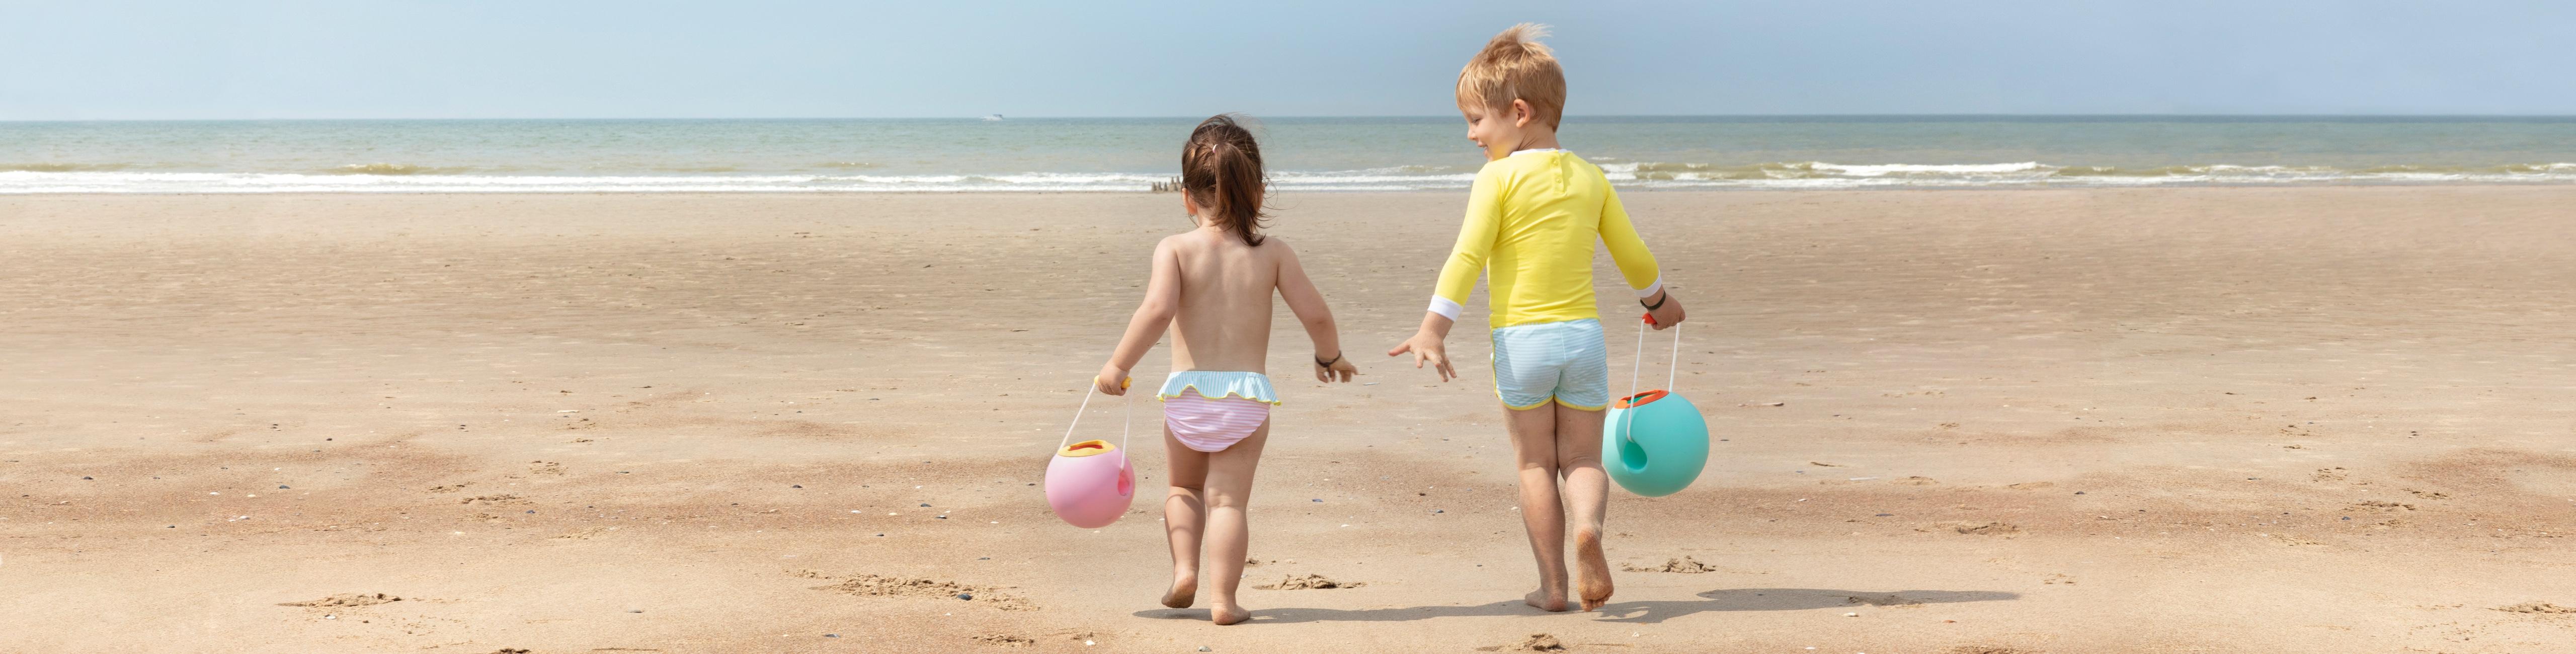 beach toys quut